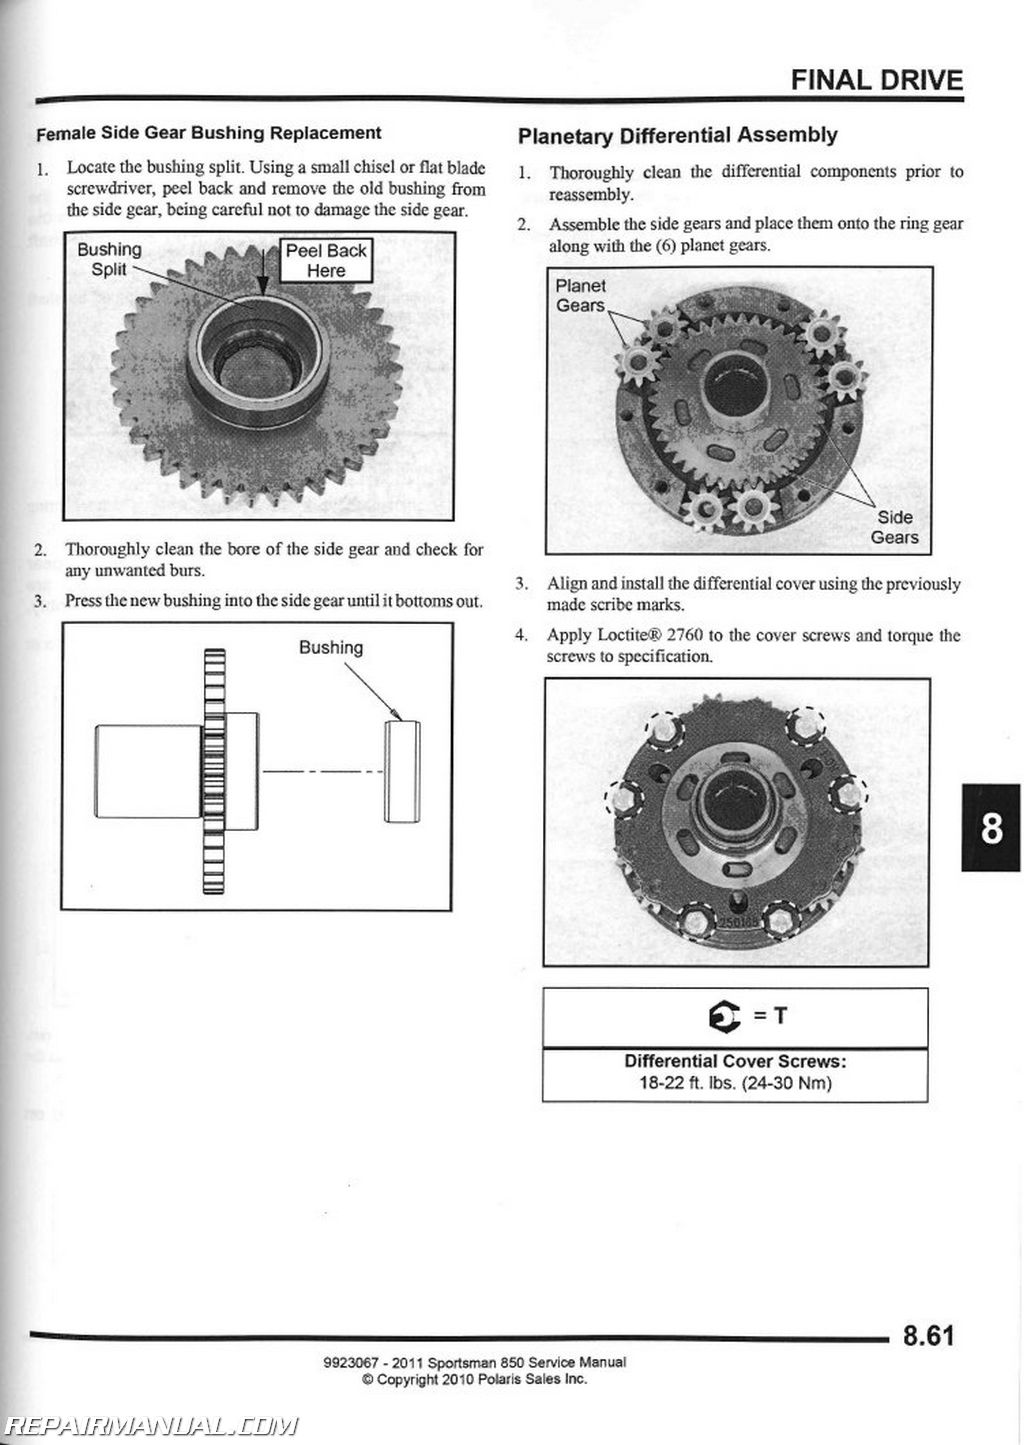 2011 Polaris Sportsman 850 Atv Service Manual